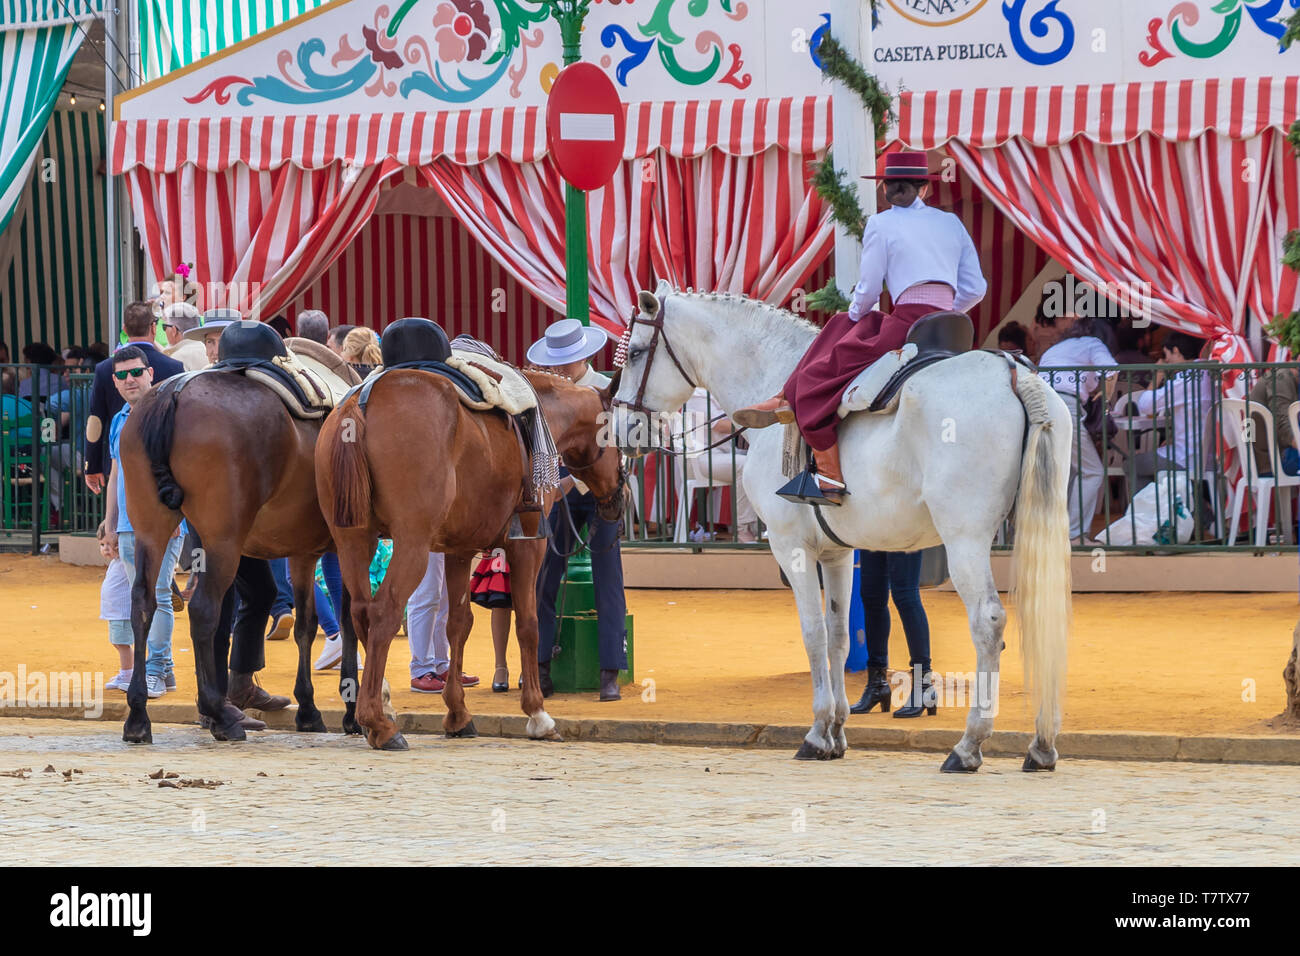 Seville, Spain - May 5, 2019: People riding horses and celebrating Seville's April Fair, Seville Fair (Feria de Sevilla). The Seville April Fair on Ma - Stock Image